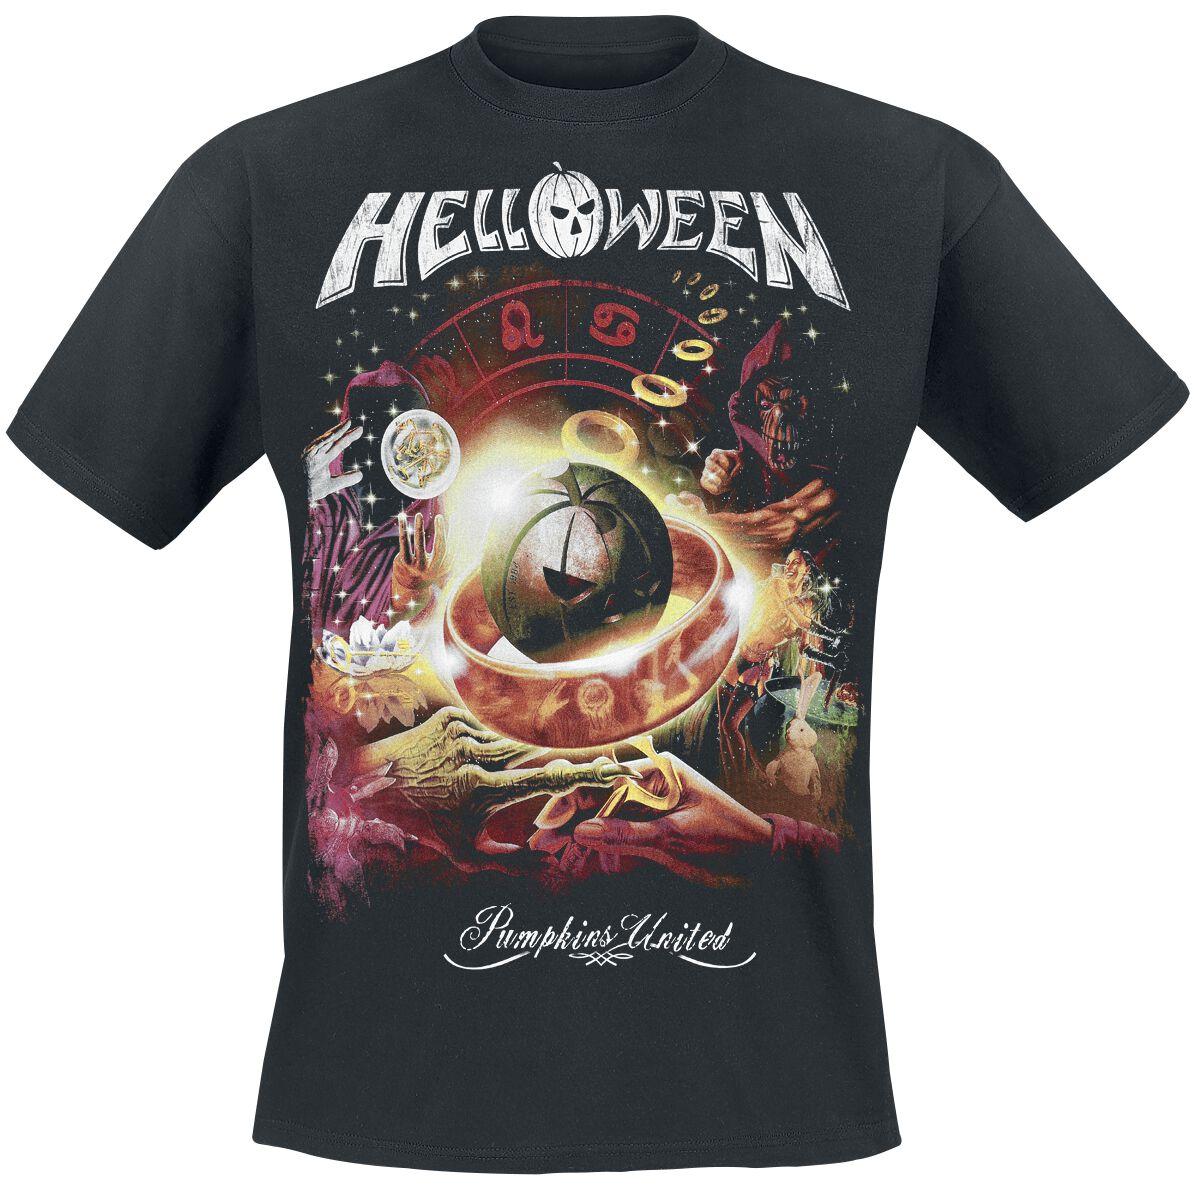 Zespoły - Koszulki - T-Shirt Helloween Tour Collage T-Shirt czarny - 373314